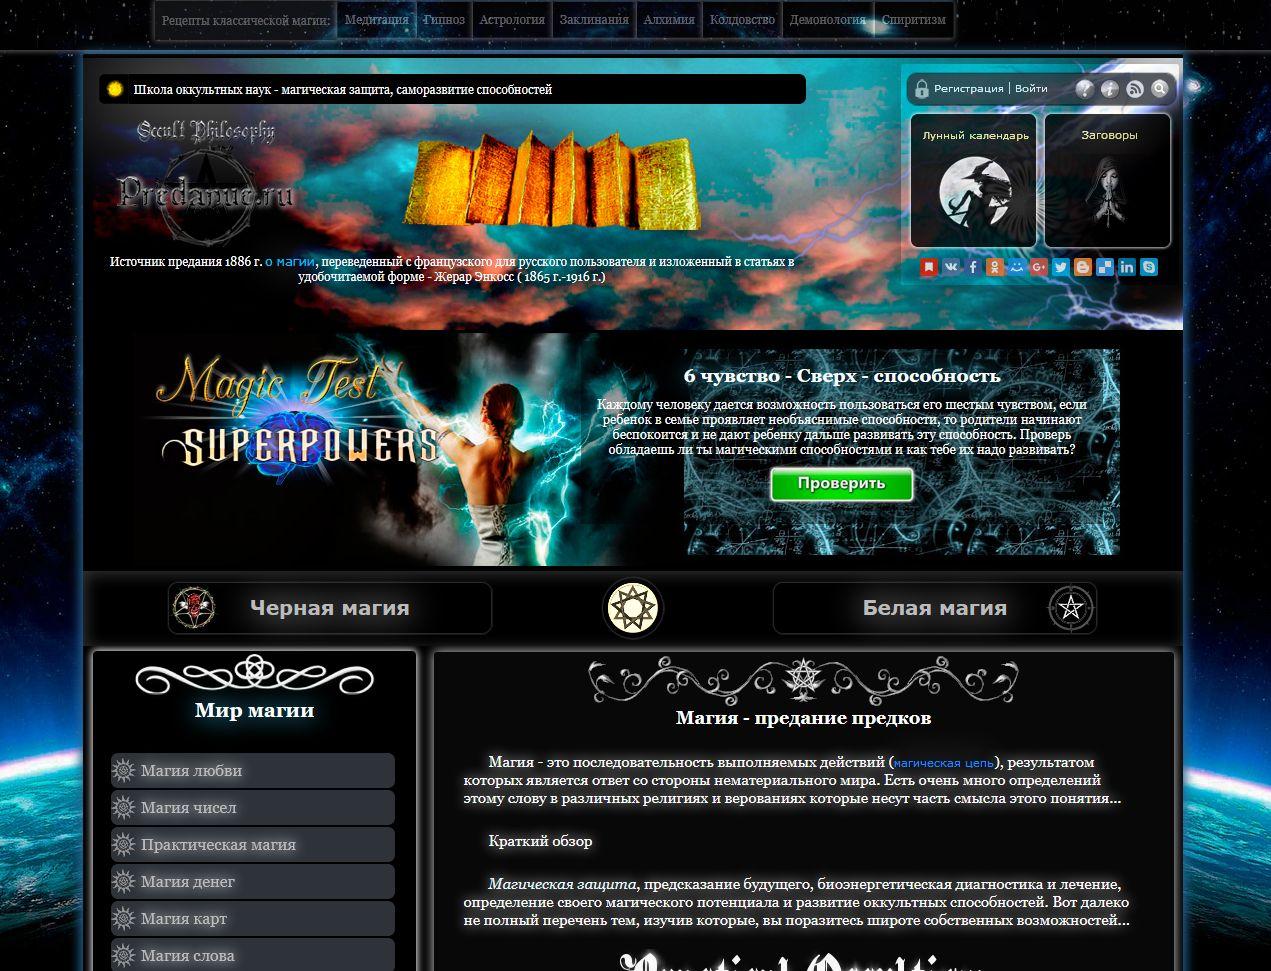 Сайт белой магии predanue.ru отзывы